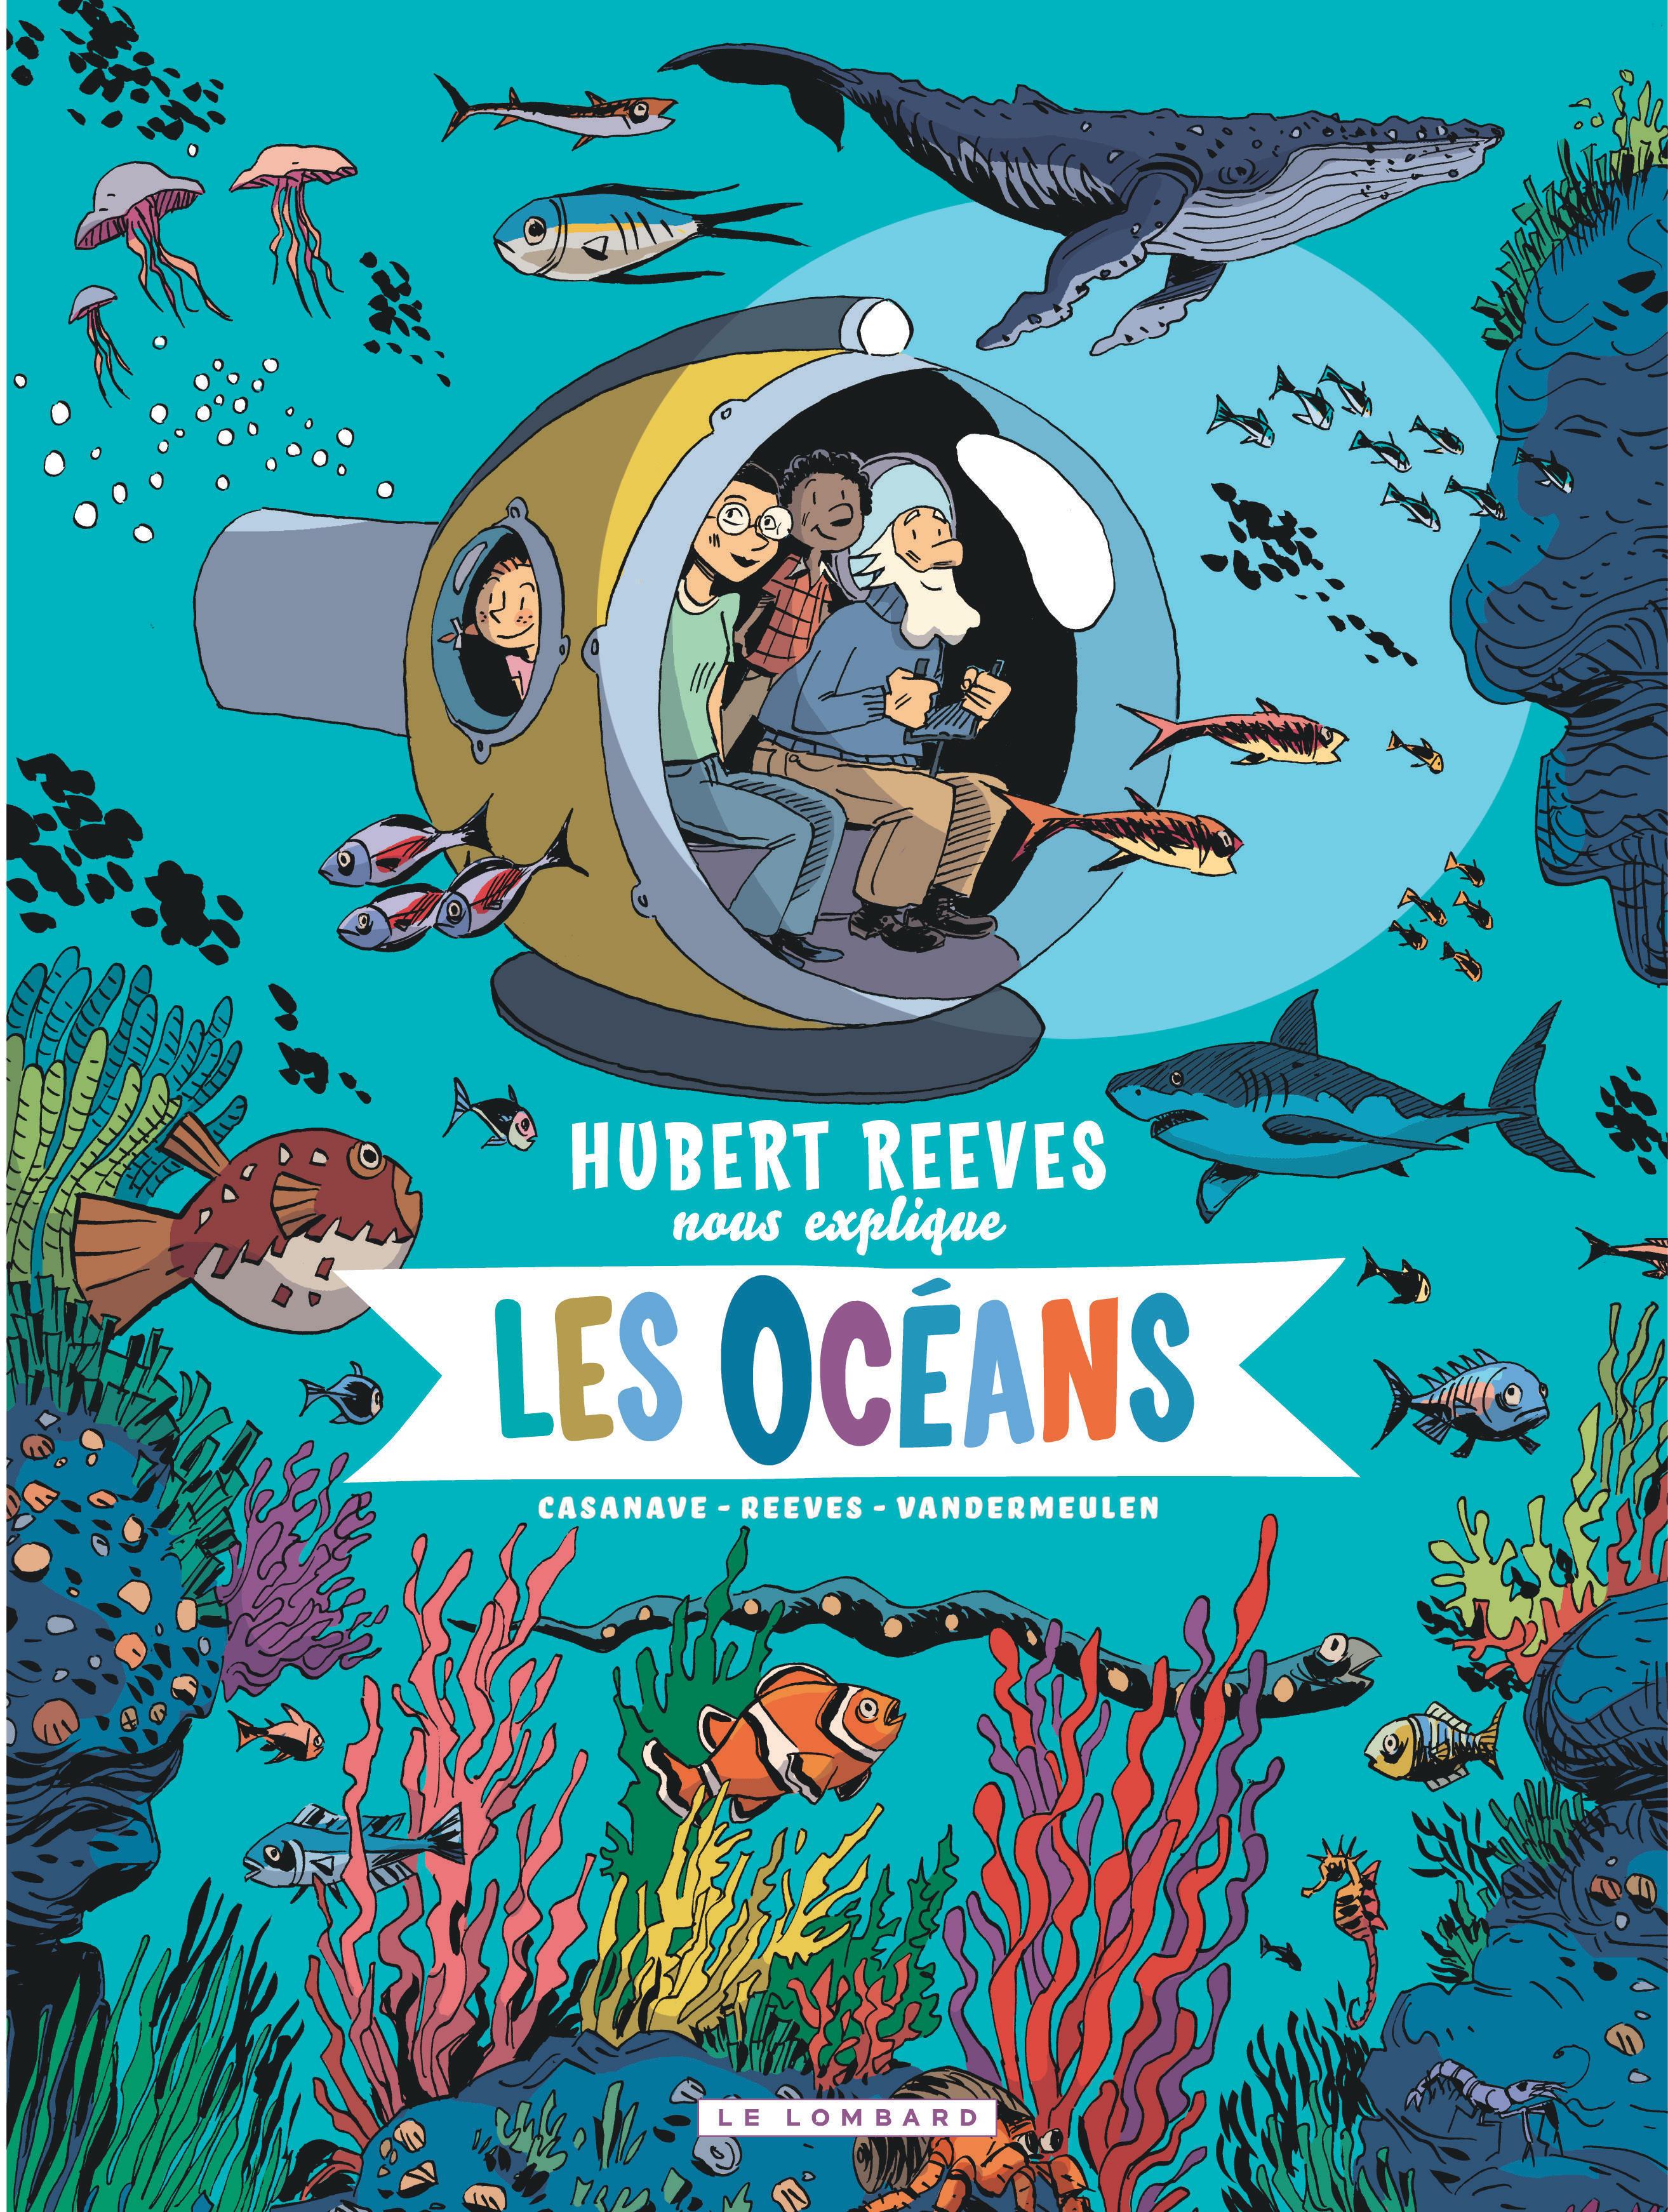 HUBERT REEVES EXPLIQUE ENFANTS - HUBERT REEVES NOUS EXPLIQUE - TOME 3 - LES OCEANS